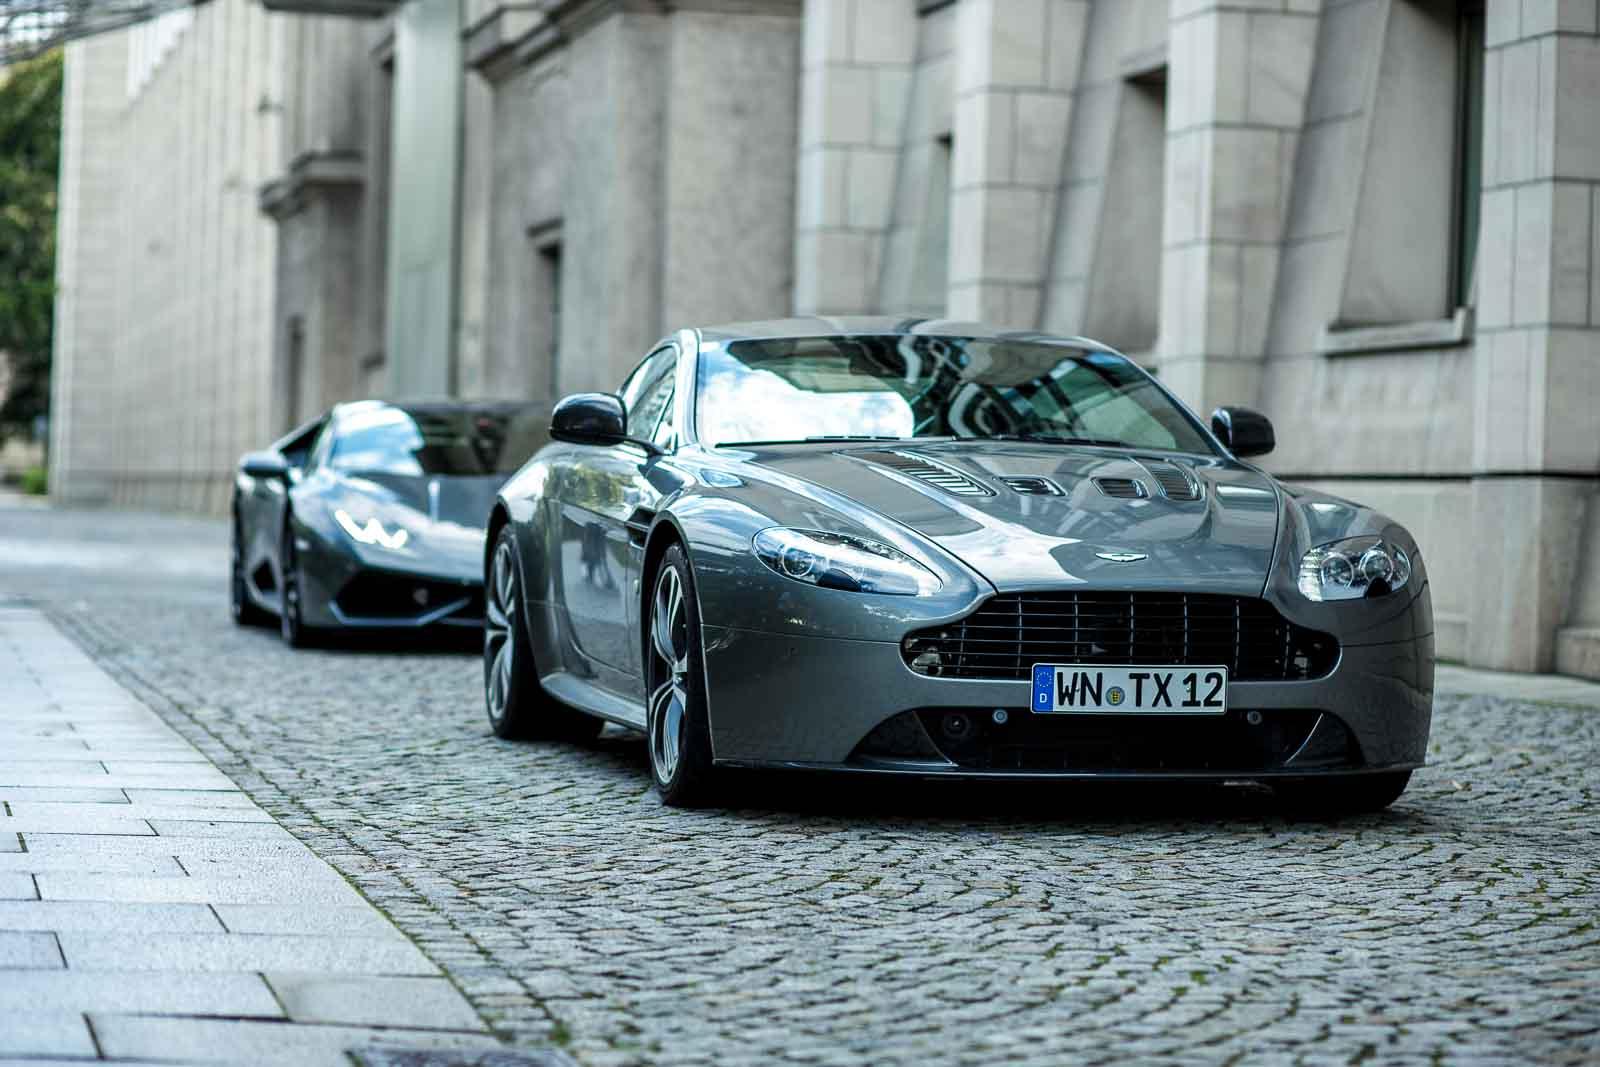 Photo Of The Day: Aston Martin V12 Vantage and Lamborghini Huracan